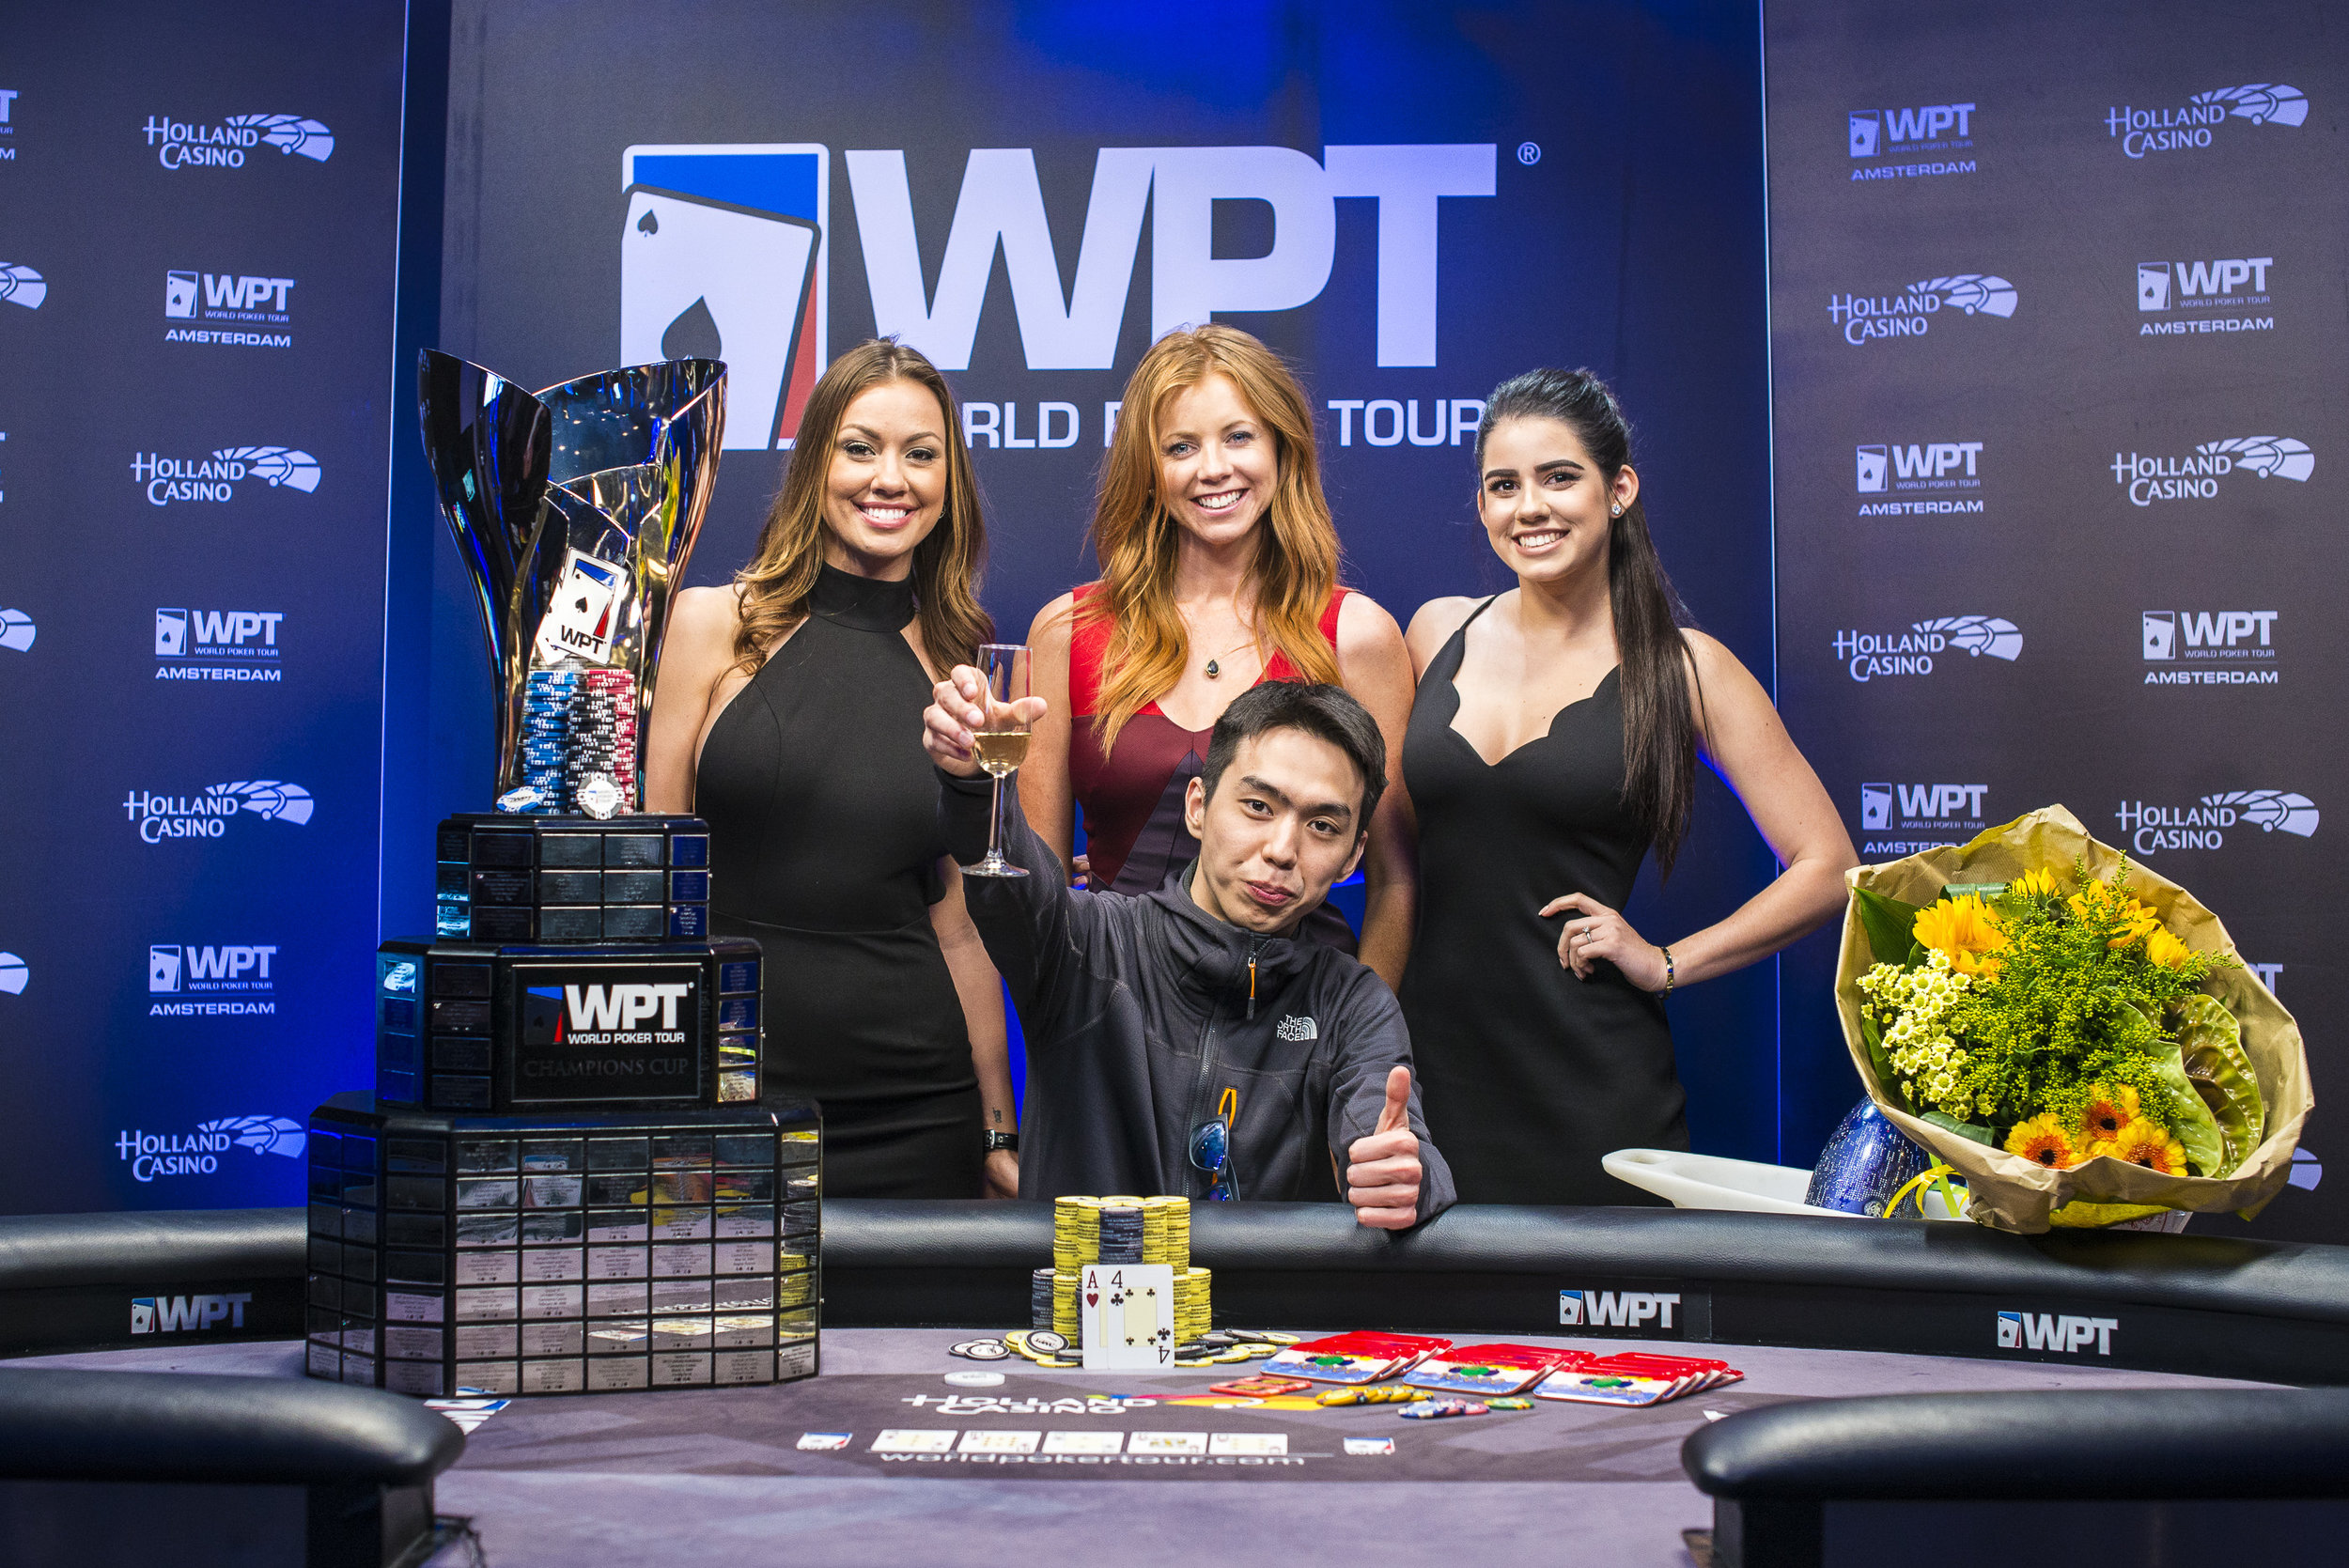 World Poker Tour_Daniel Danivar Wins WPT Amsterdam! _DA65393.jpg